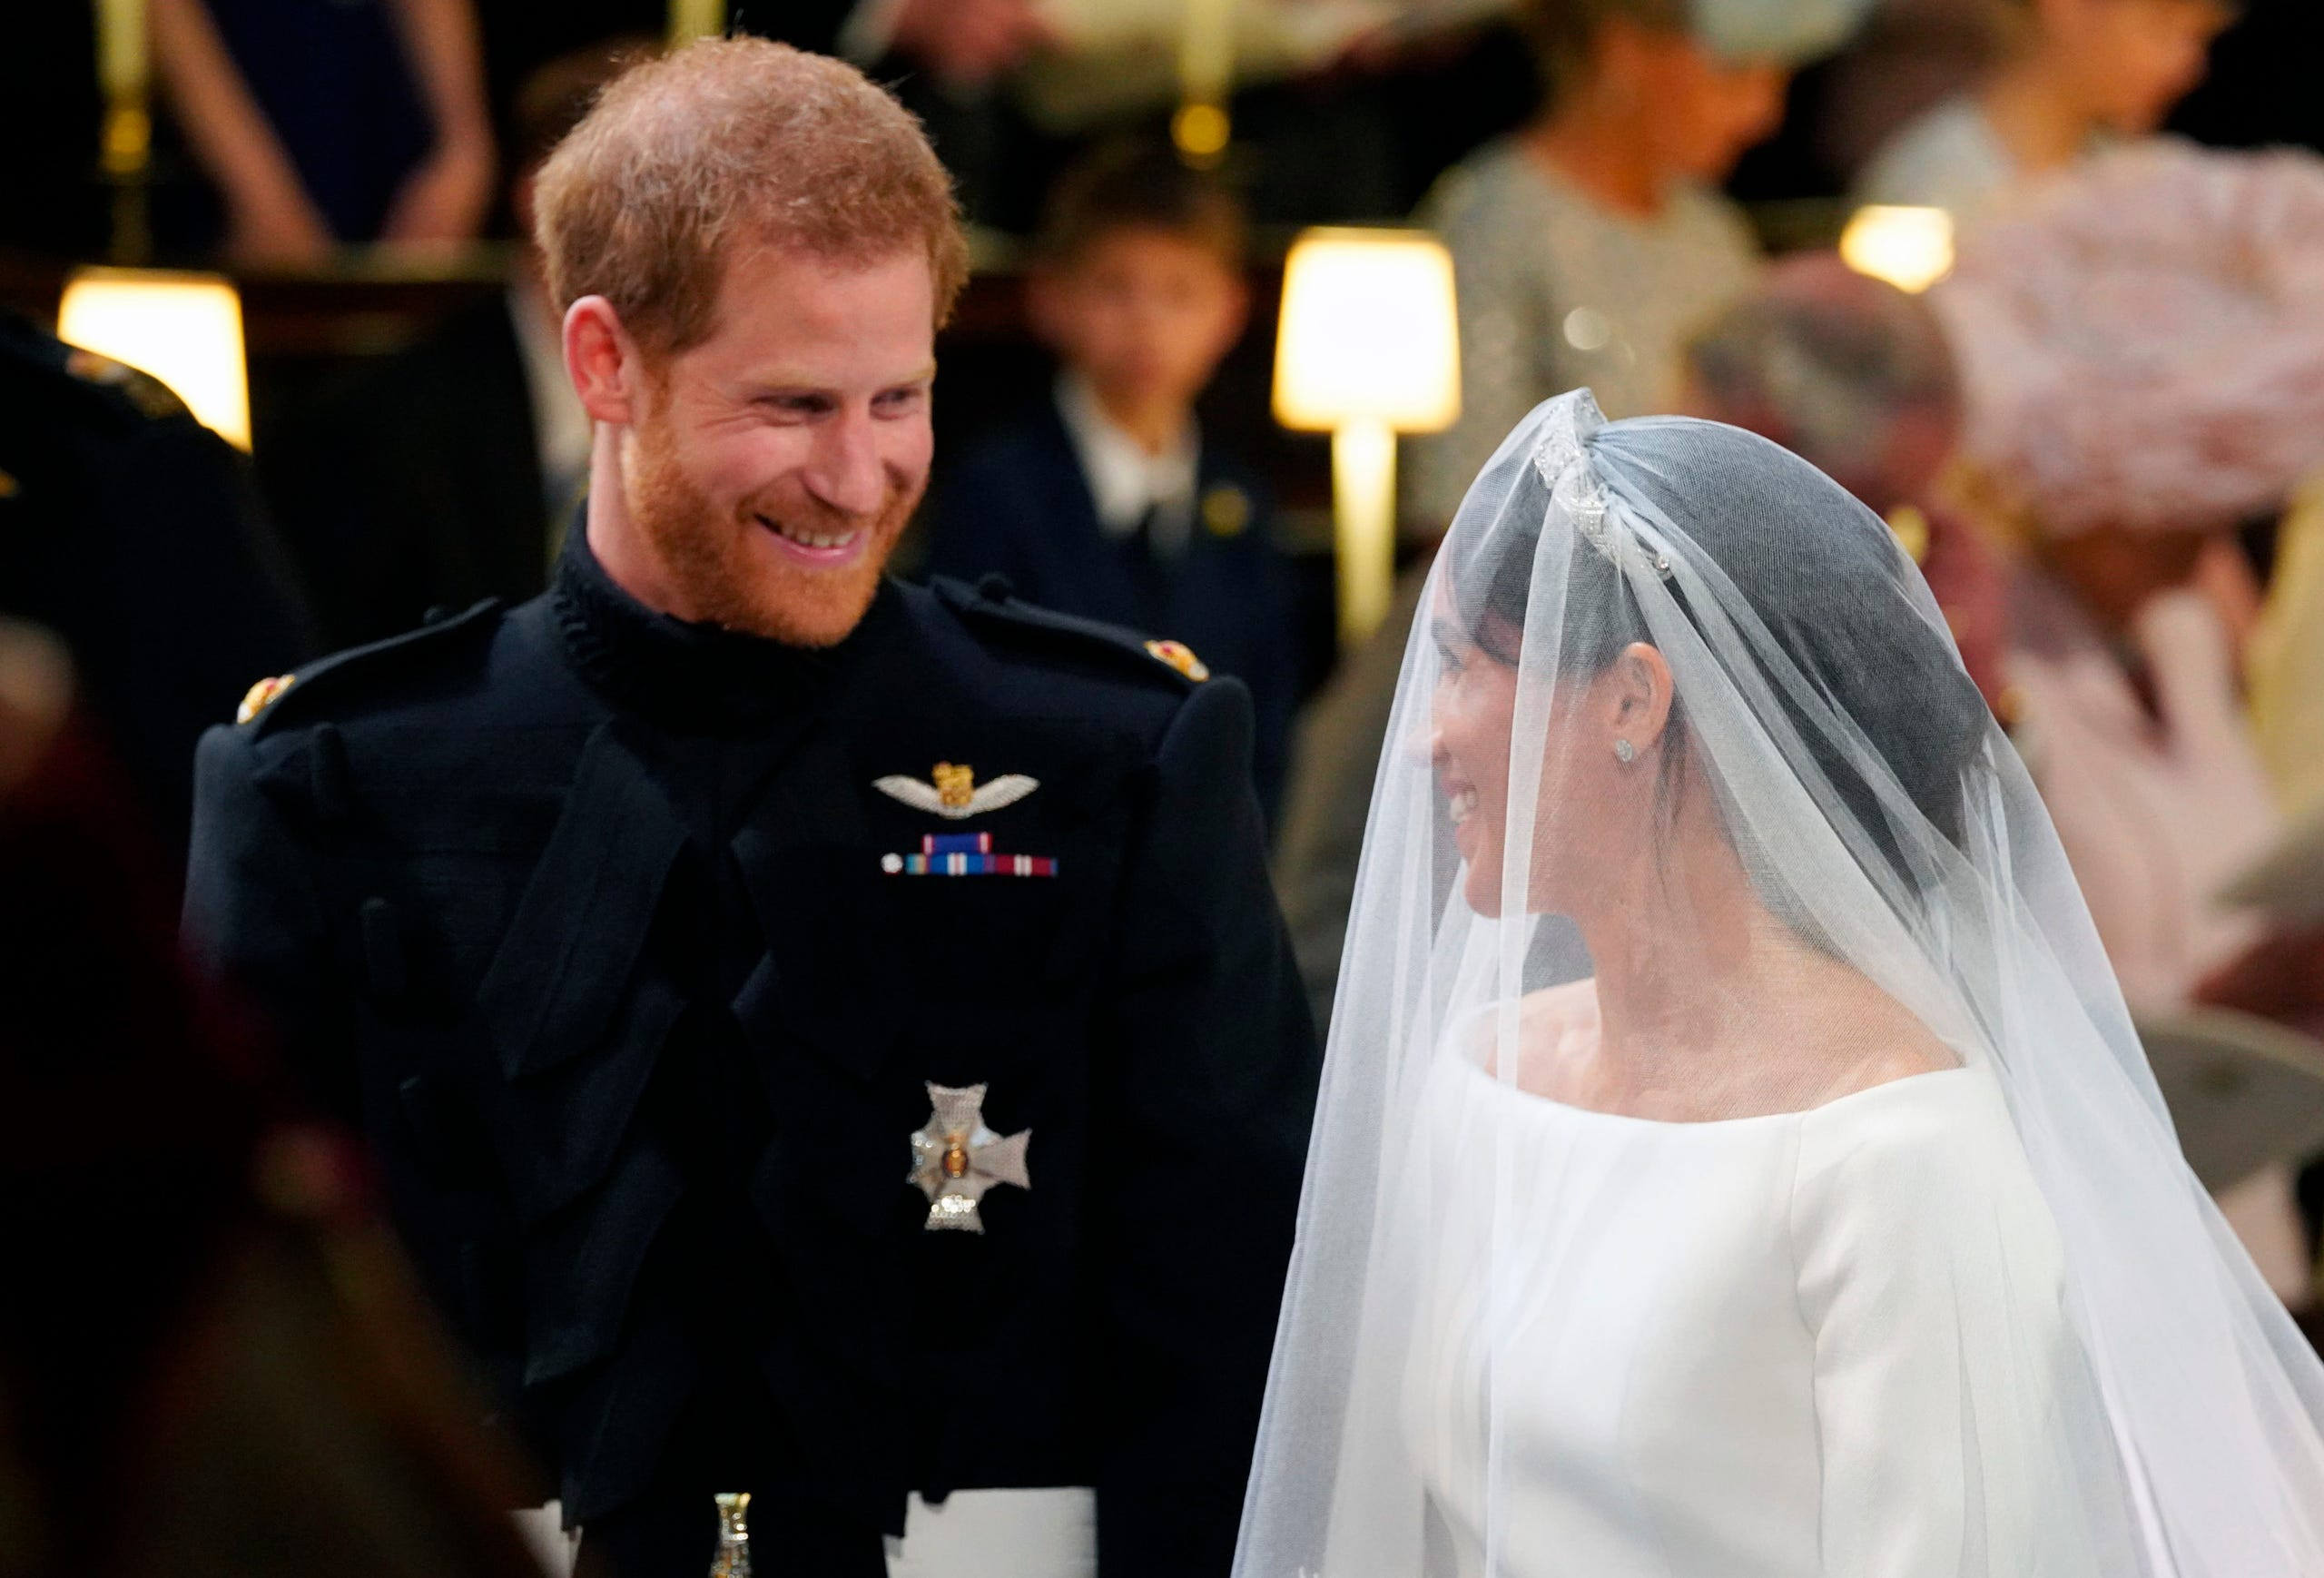 Givenchy Wedding Dress.See Meghan Markle S Stunning Givenchy Wedding Dress From Every